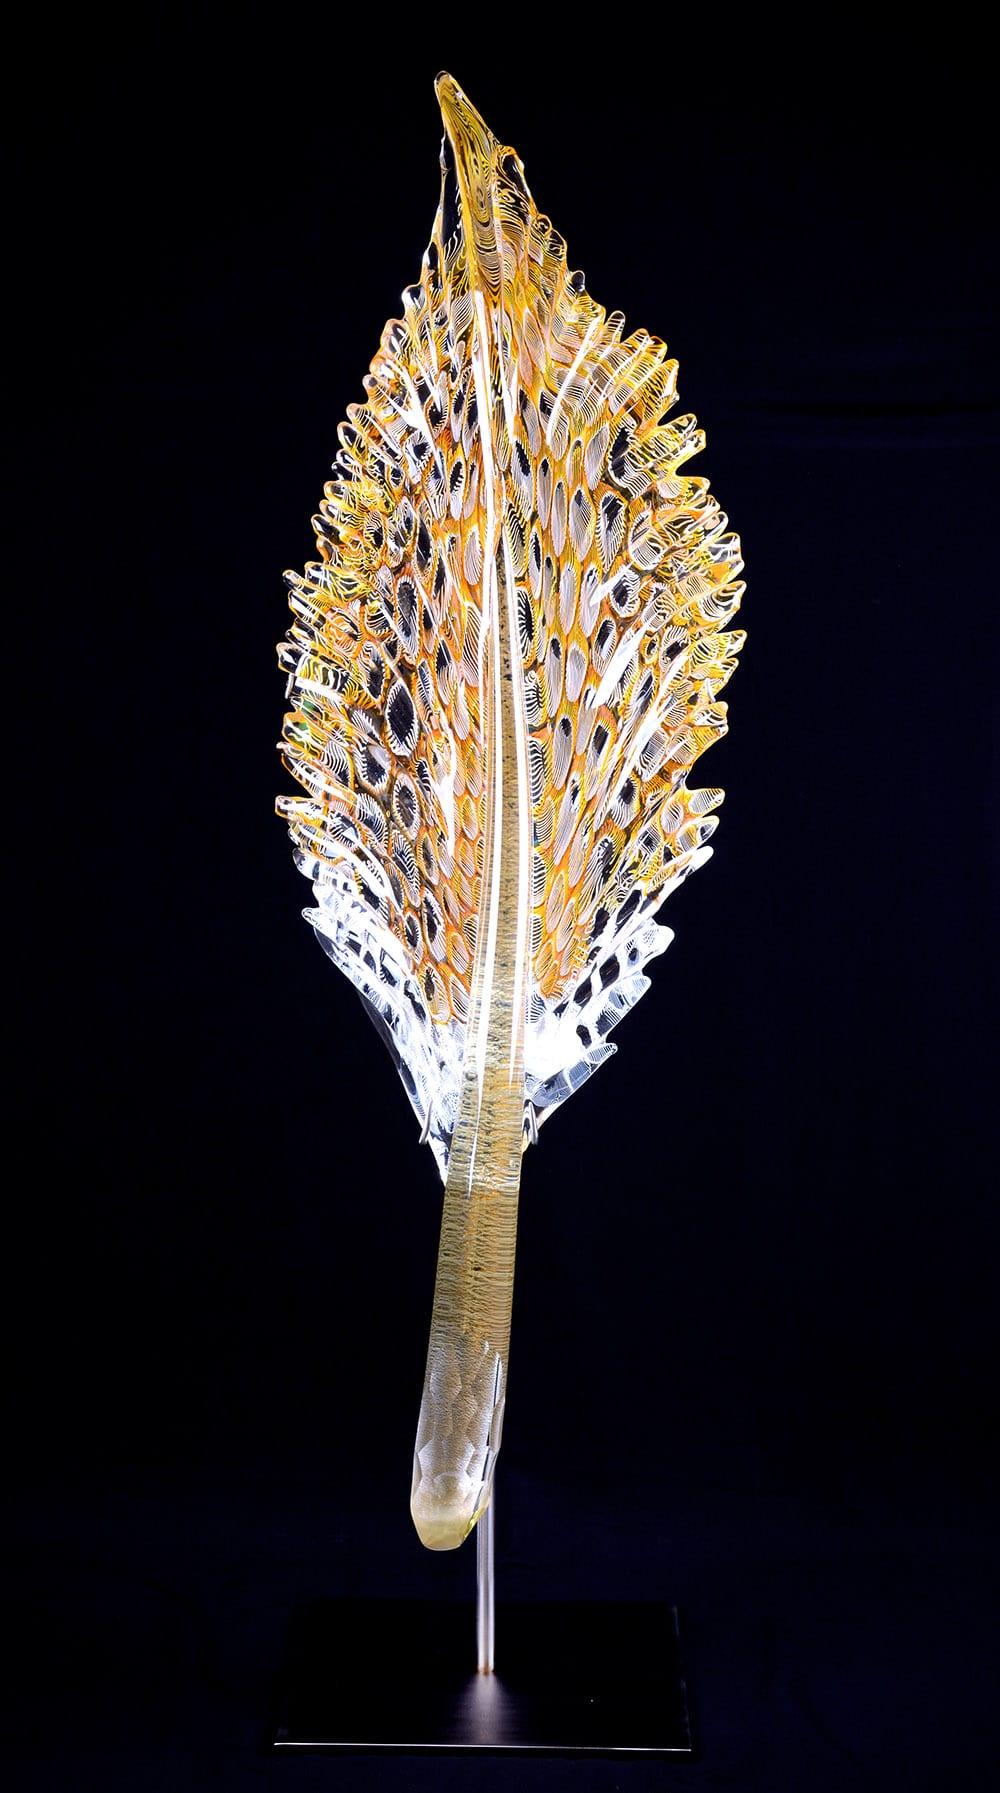 Gold Topaz Dragon Stem Feather   Nic McGuire   Sculpture-Exposures International Gallery of Fine Art - Sedona AZ